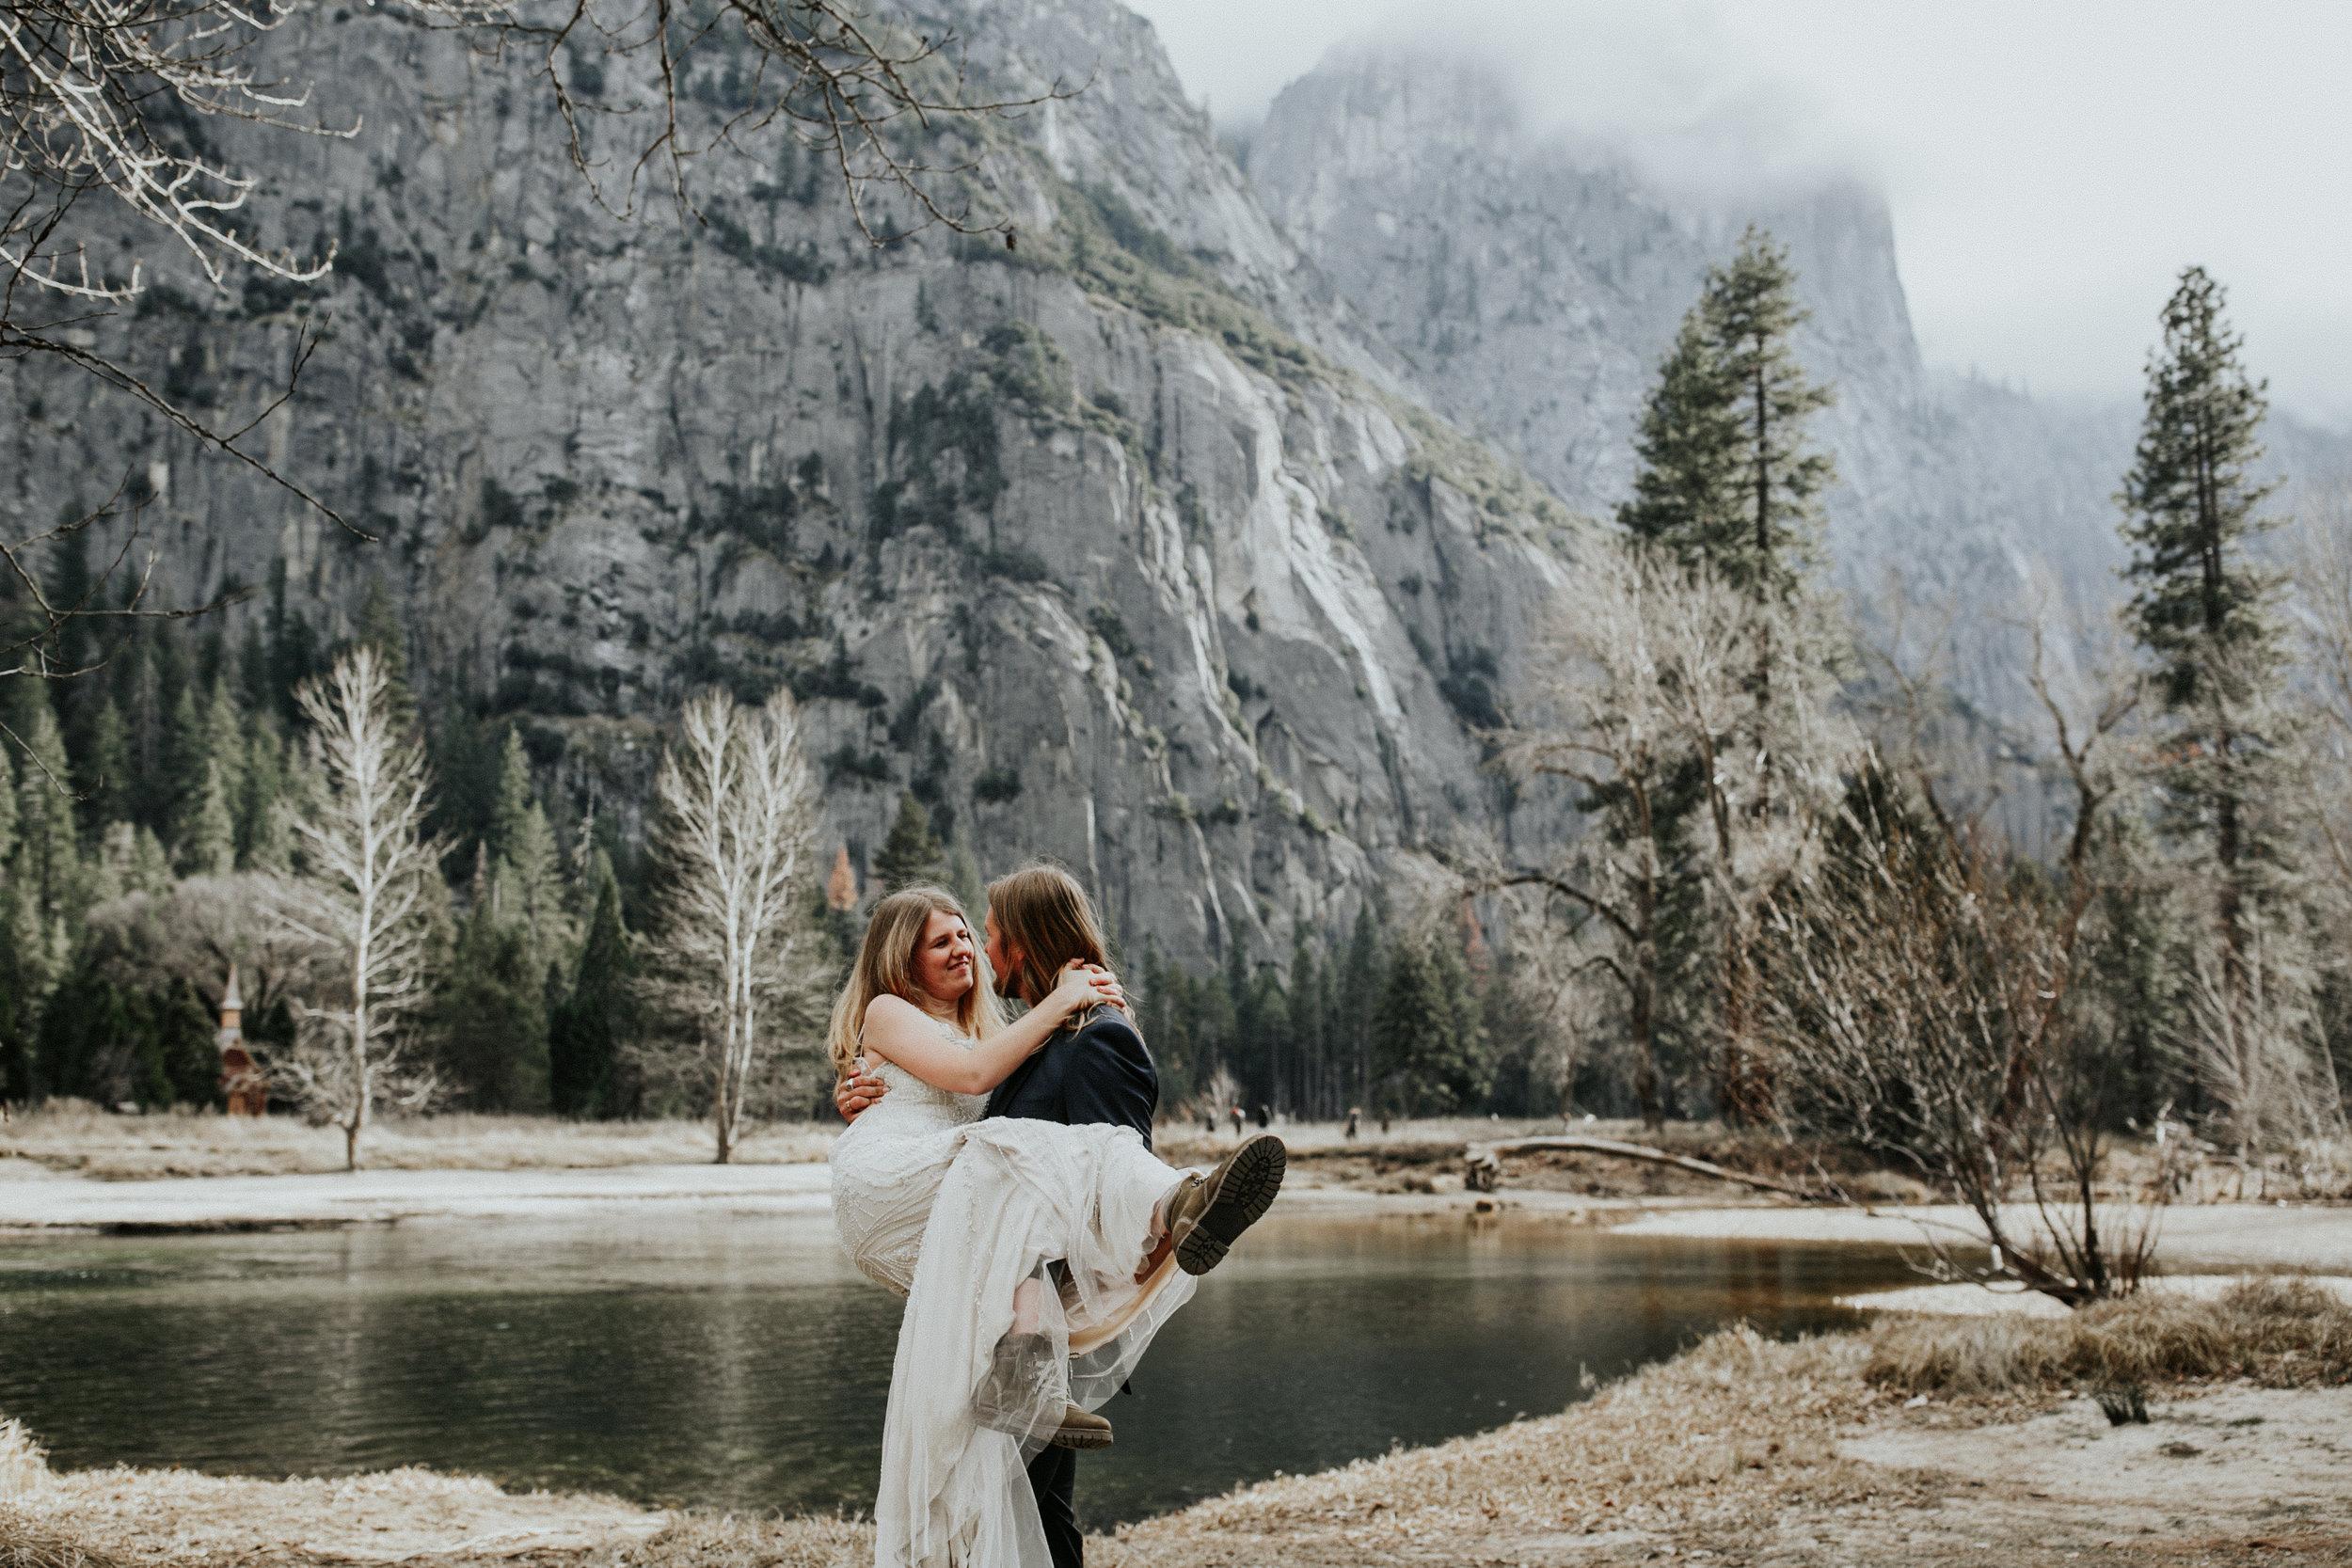 adventure-california-yosemite-photographer-grace-t-photography-48.jpg